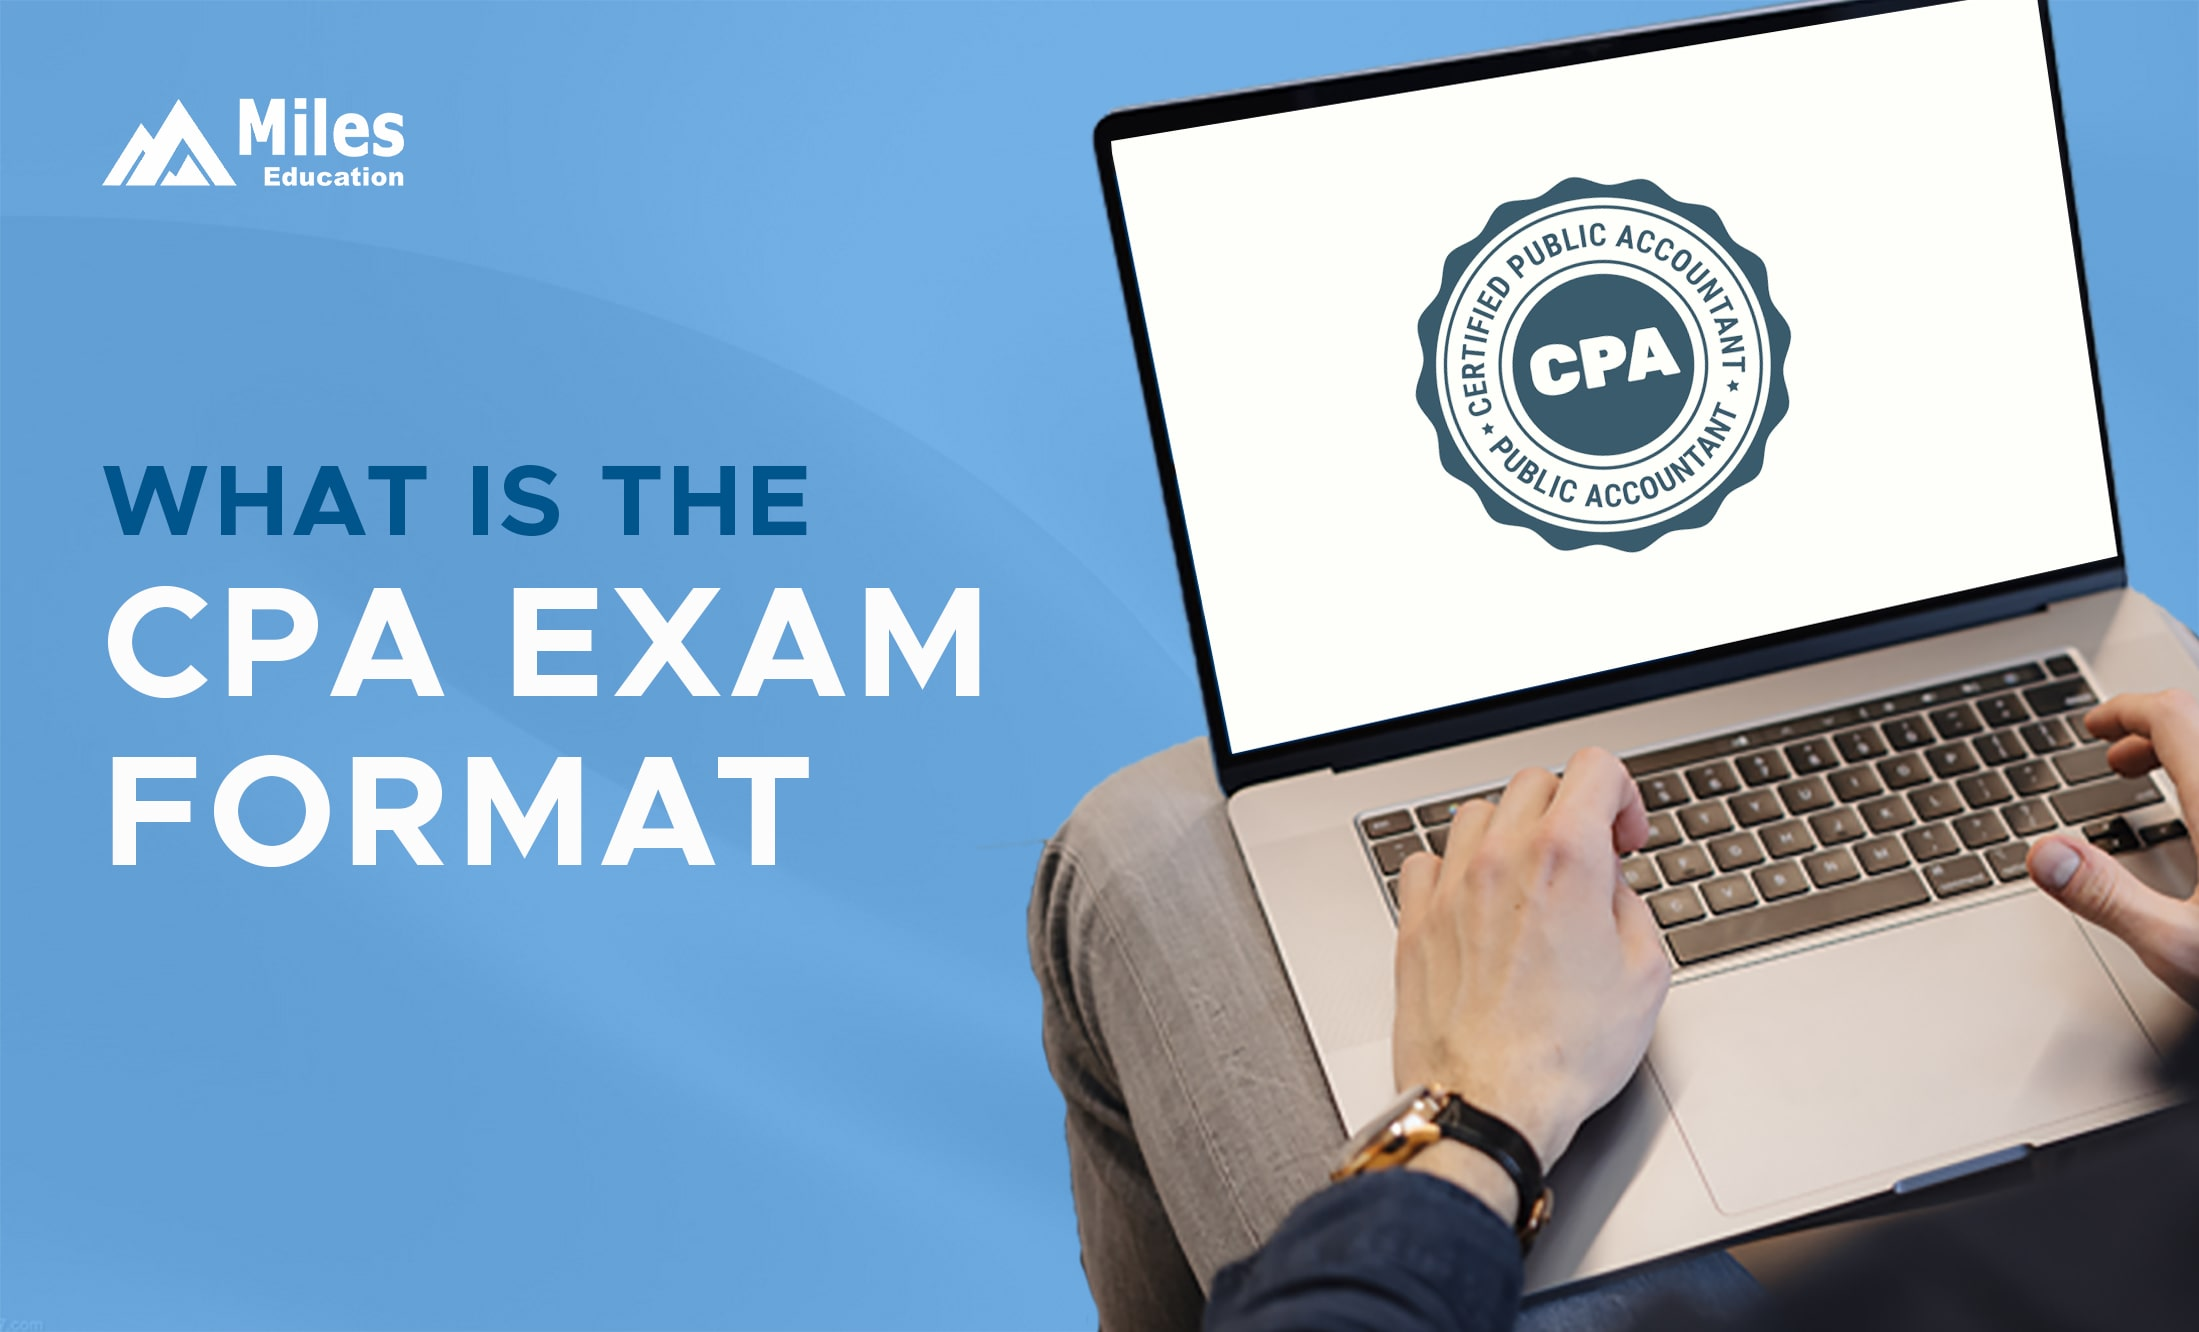 CPA exam format